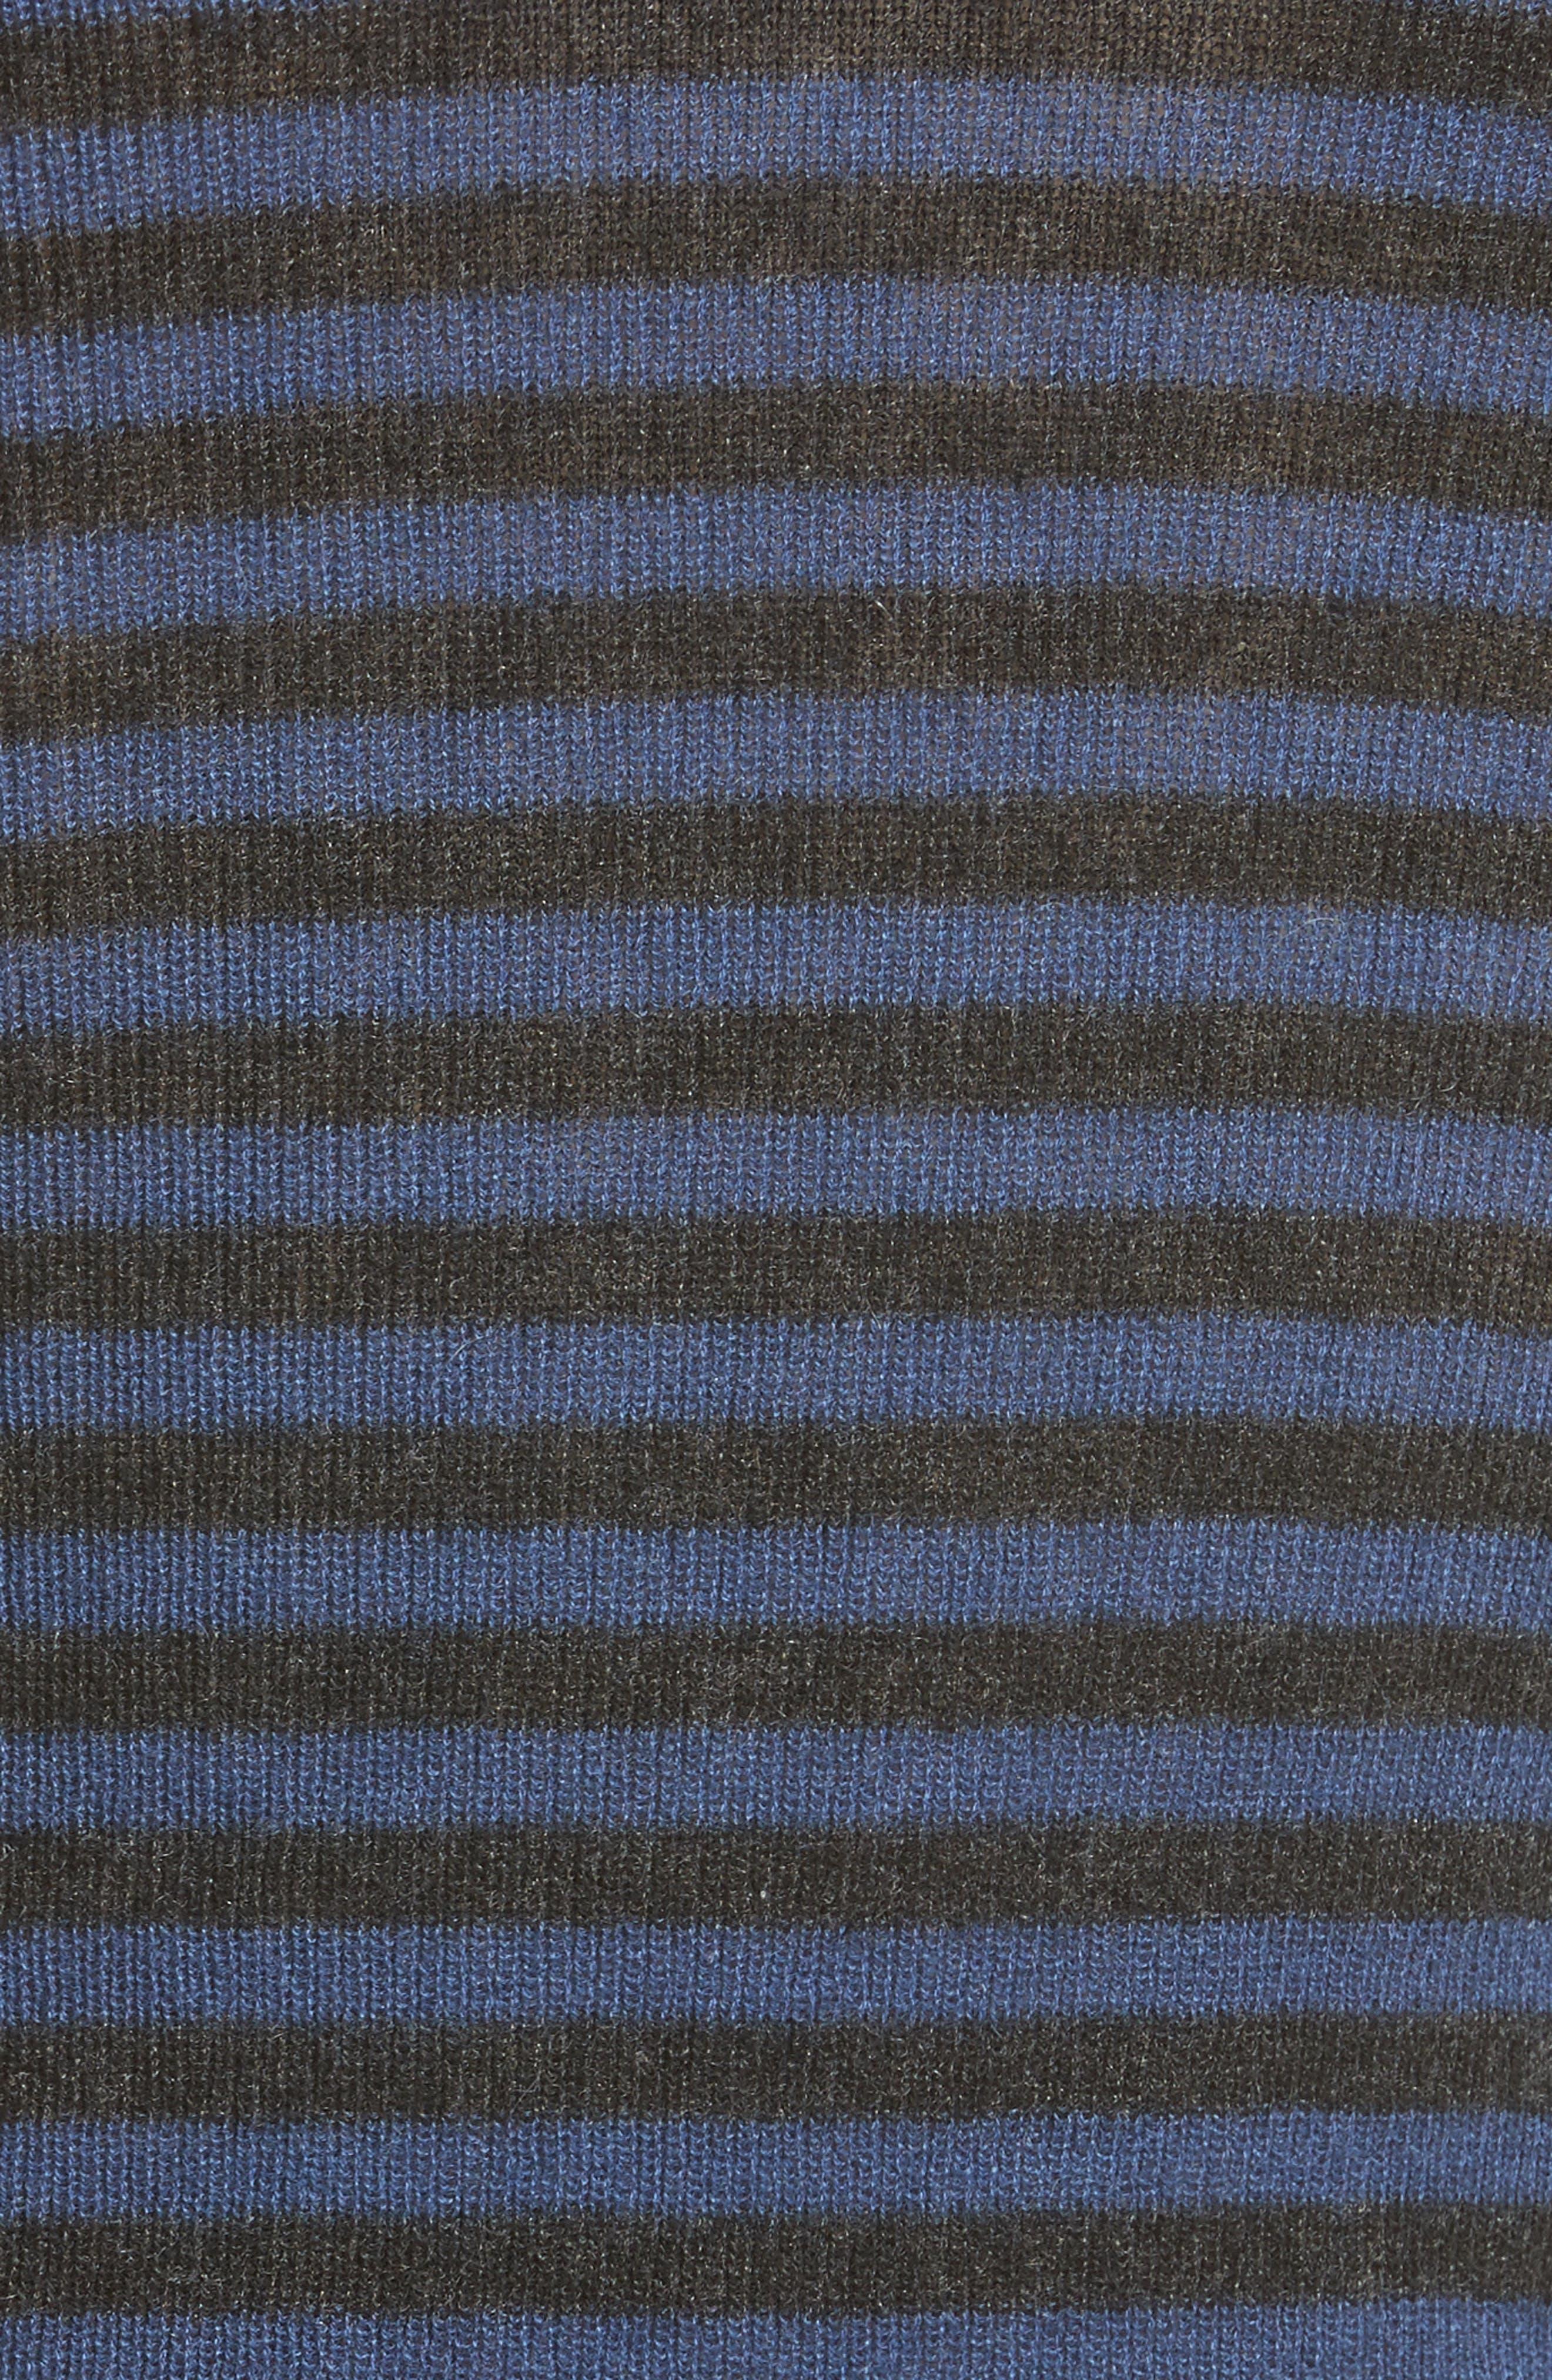 Stripe Cashmere Sweater,                             Alternate thumbnail 5, color,                             472